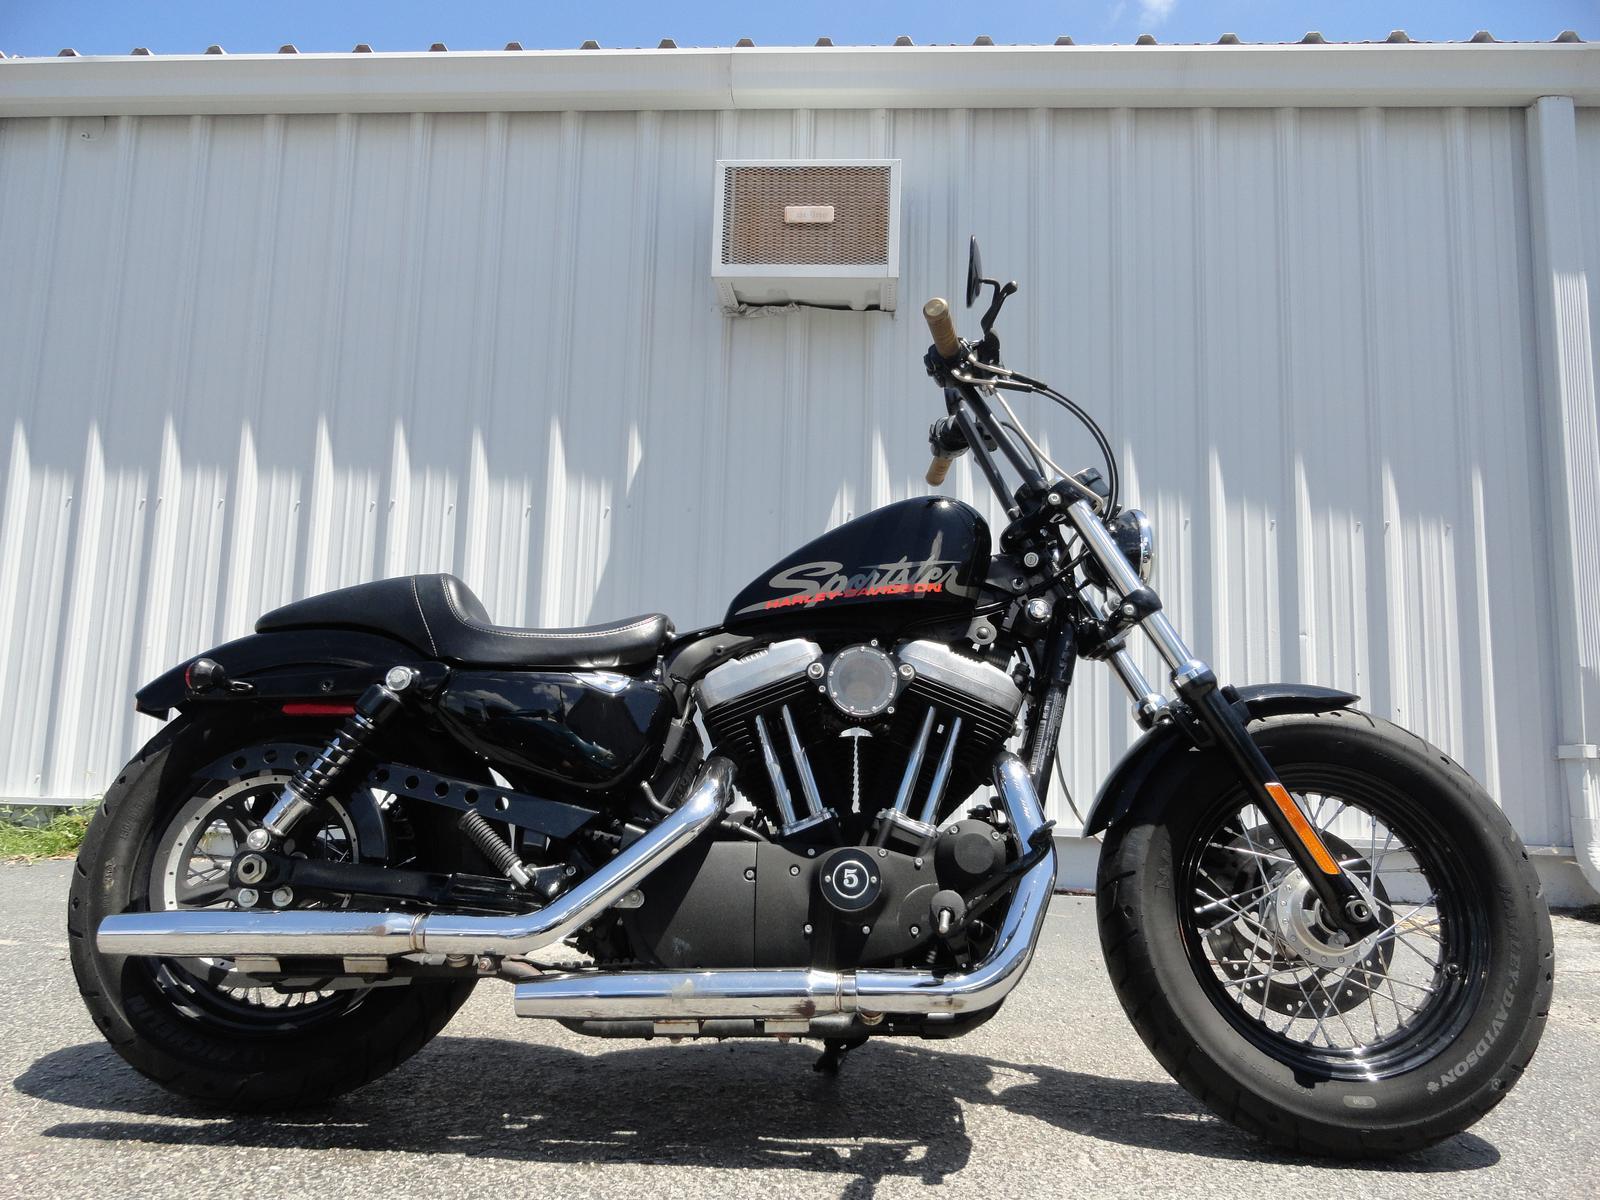 2011 Harley-Davidson® Sportster Forty-Eight